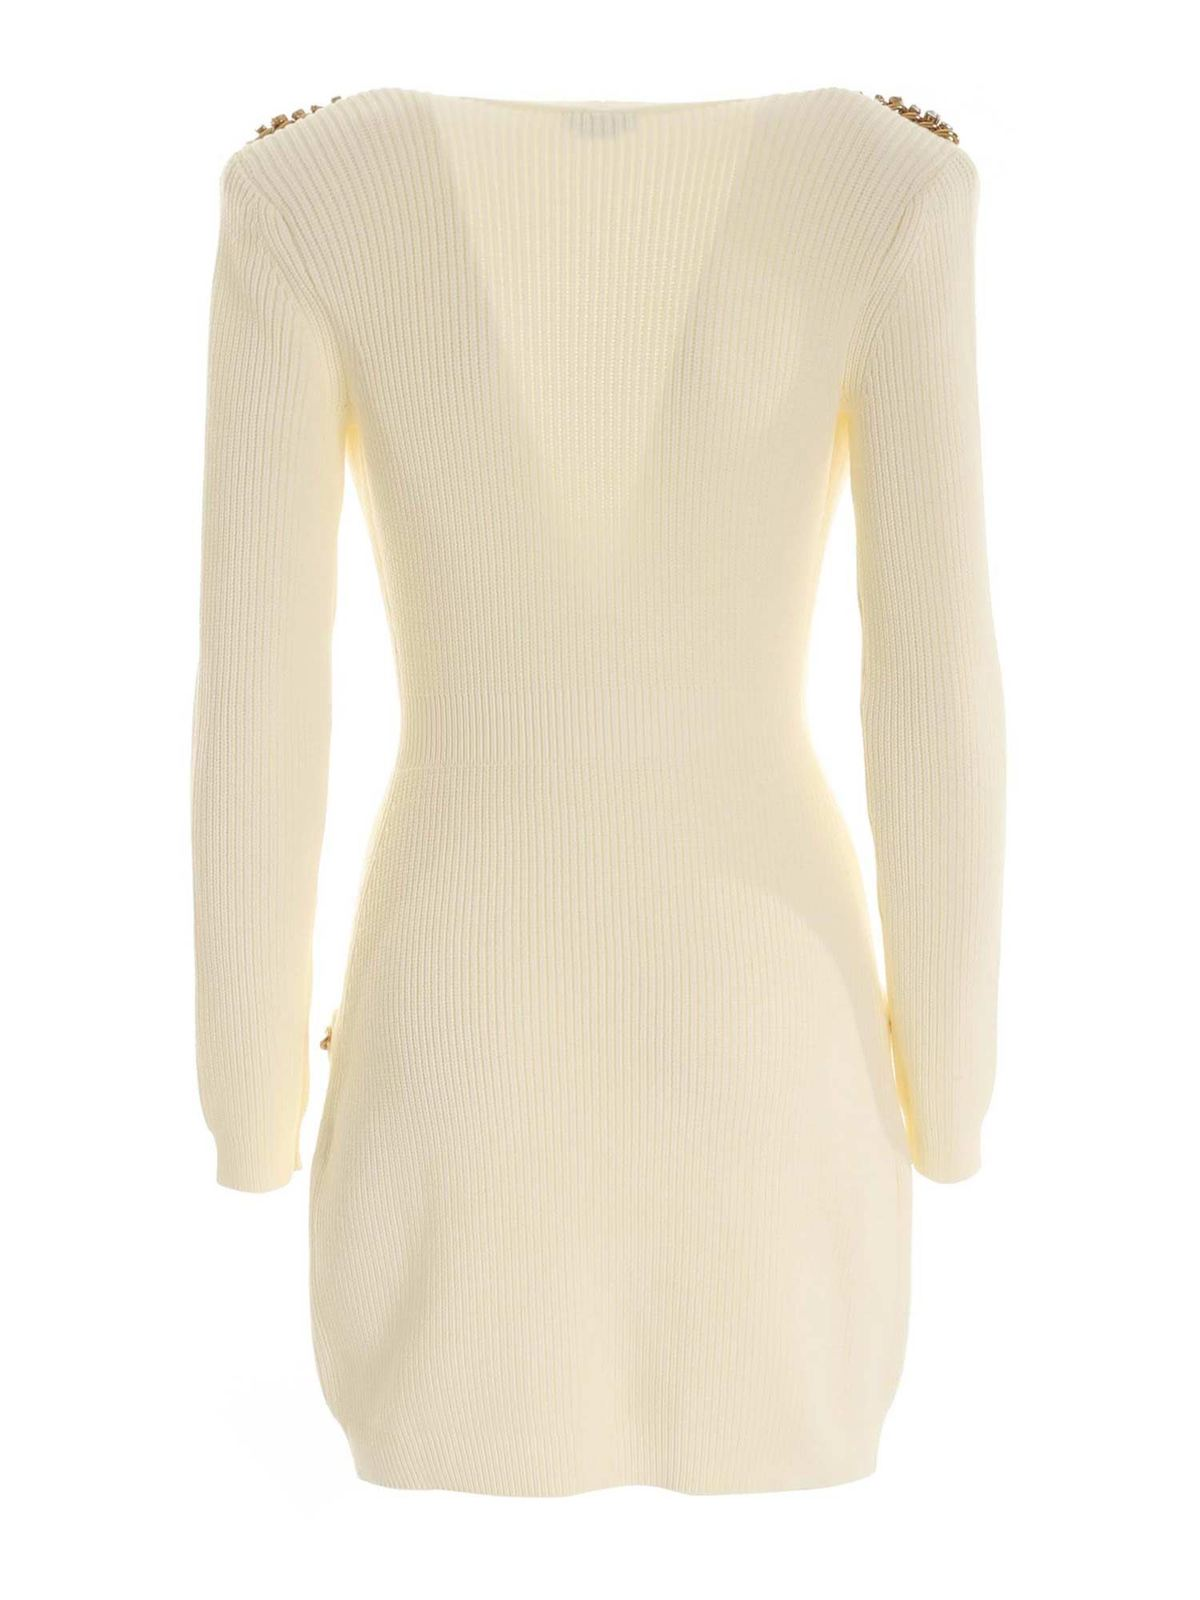 Butter double breasted cardigan dress ELISABETTA FRANCHI | Dresses | AM24S06E2193